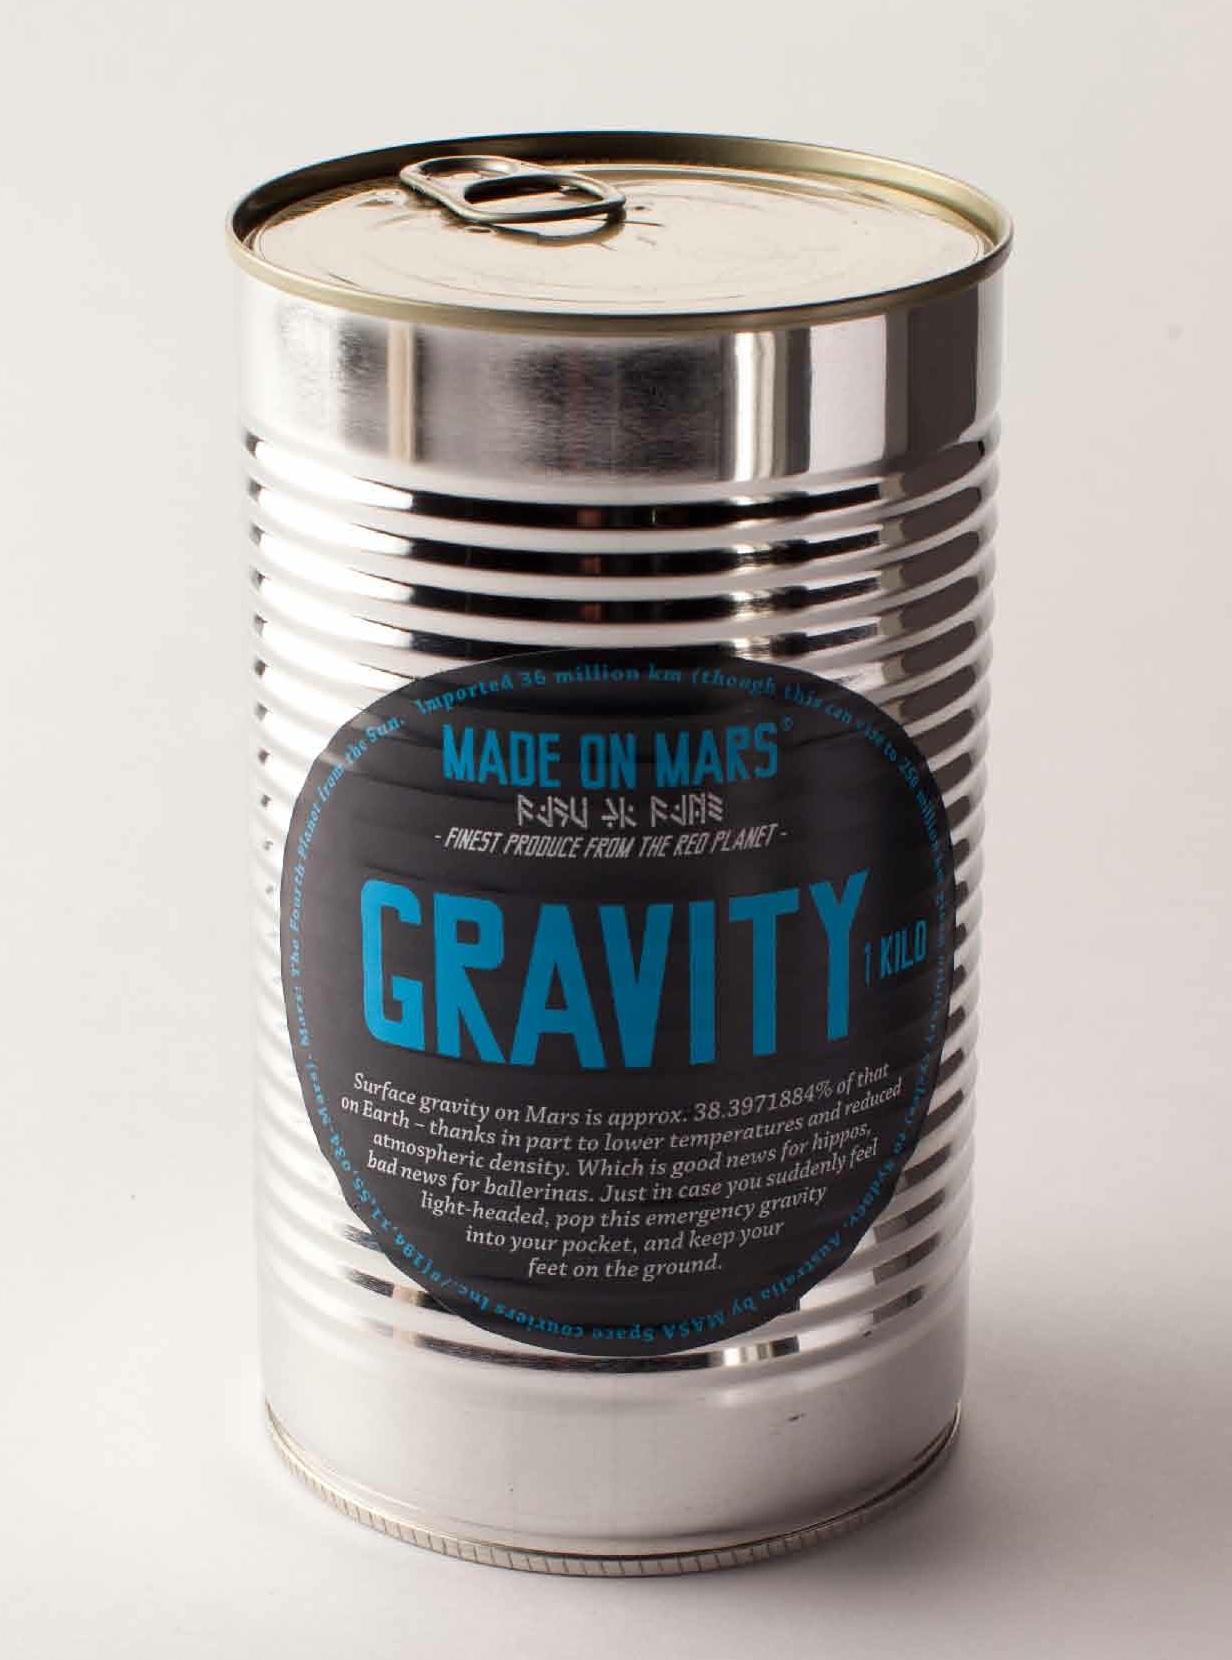 Gravity - image